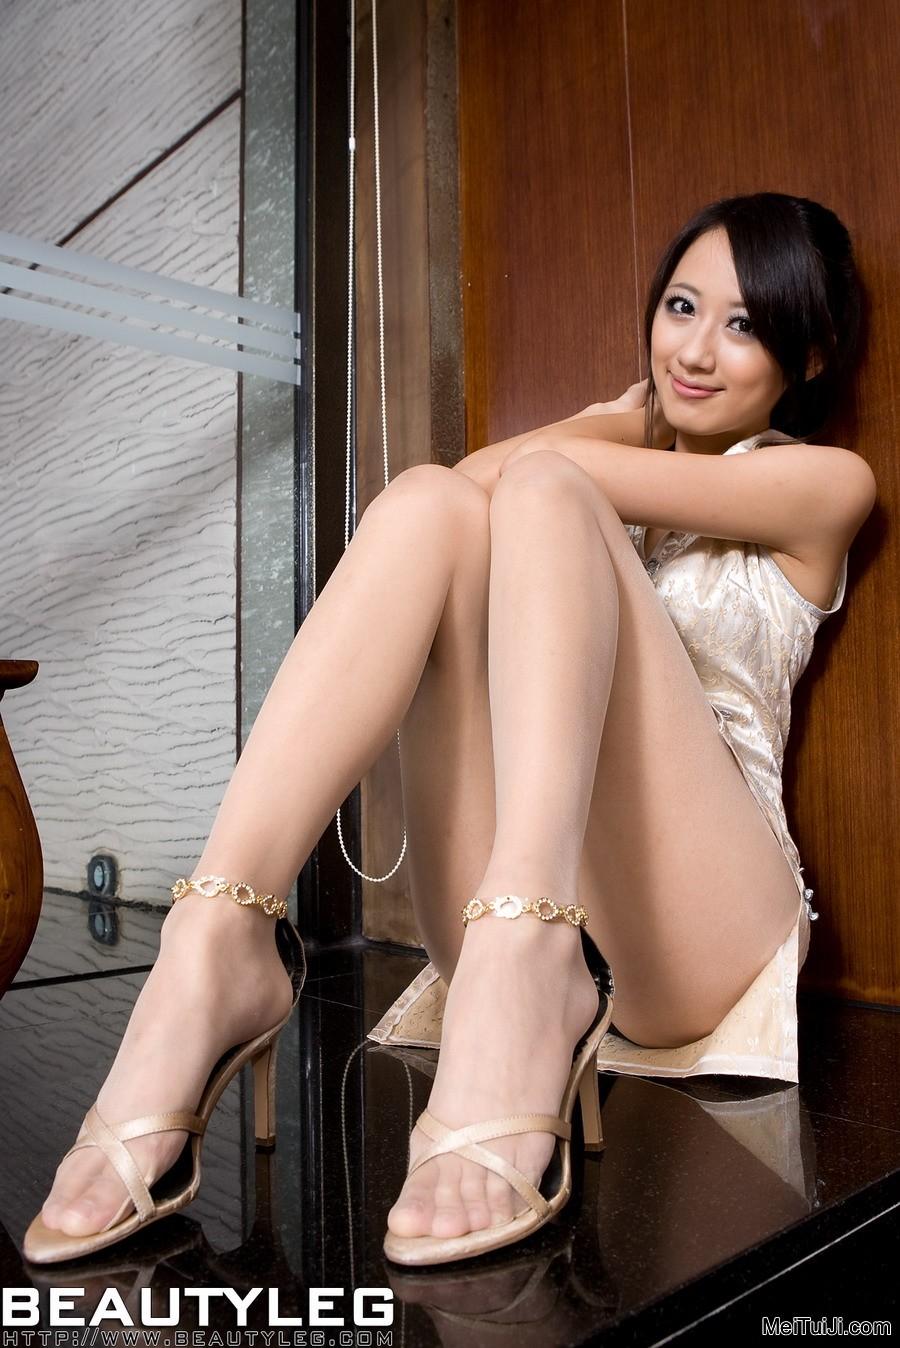 long leg girl picture